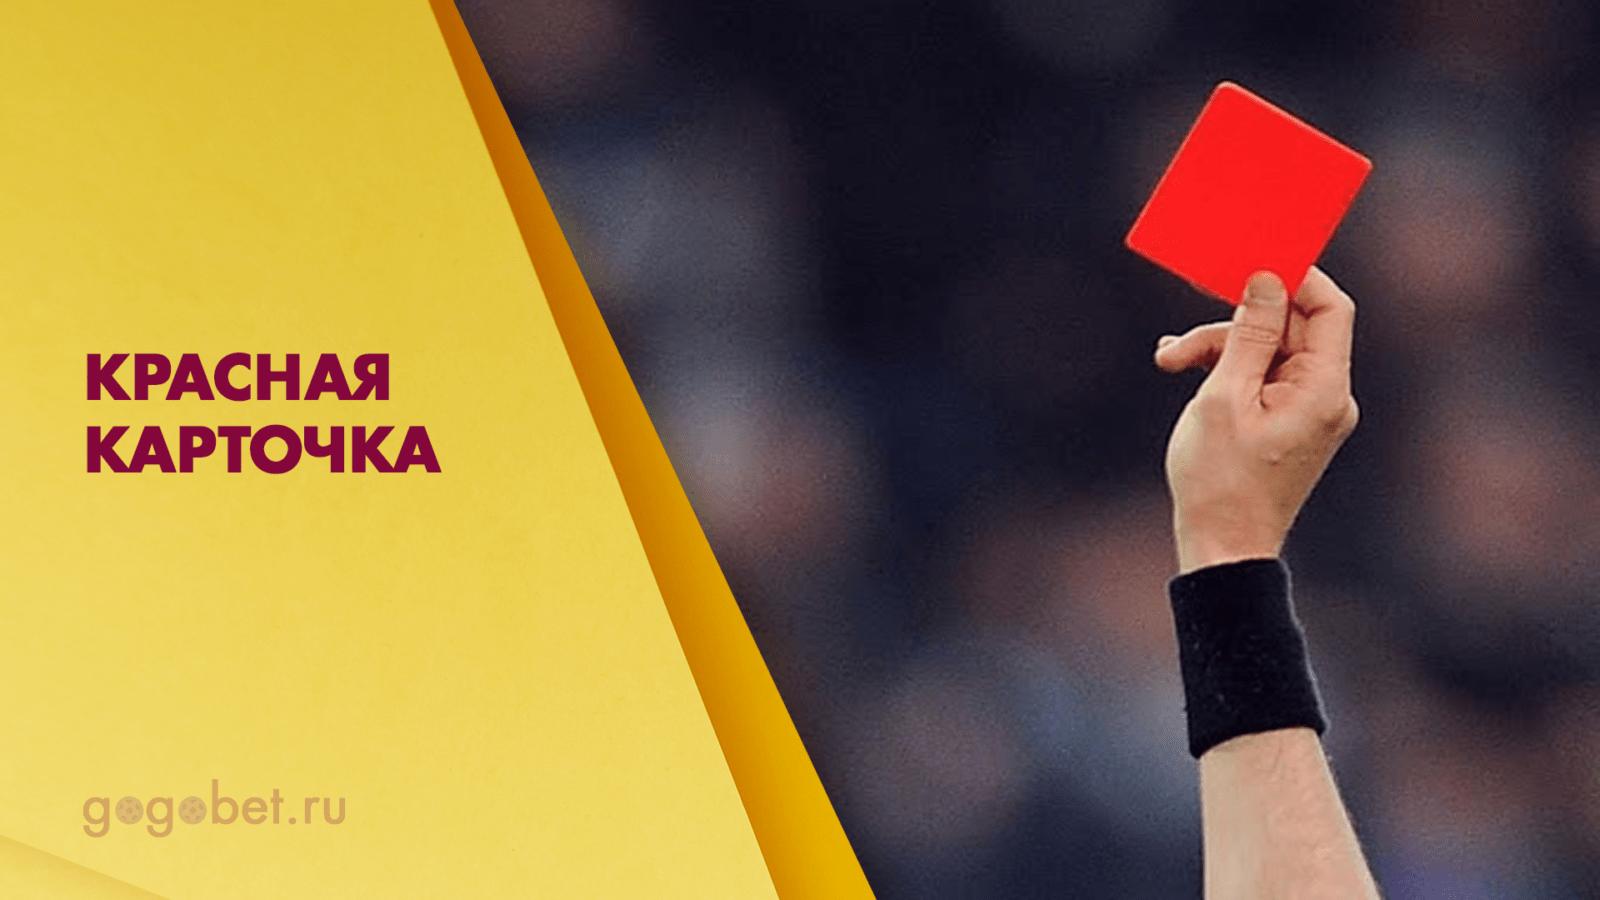 Нарушение правил футбола: красная карточка